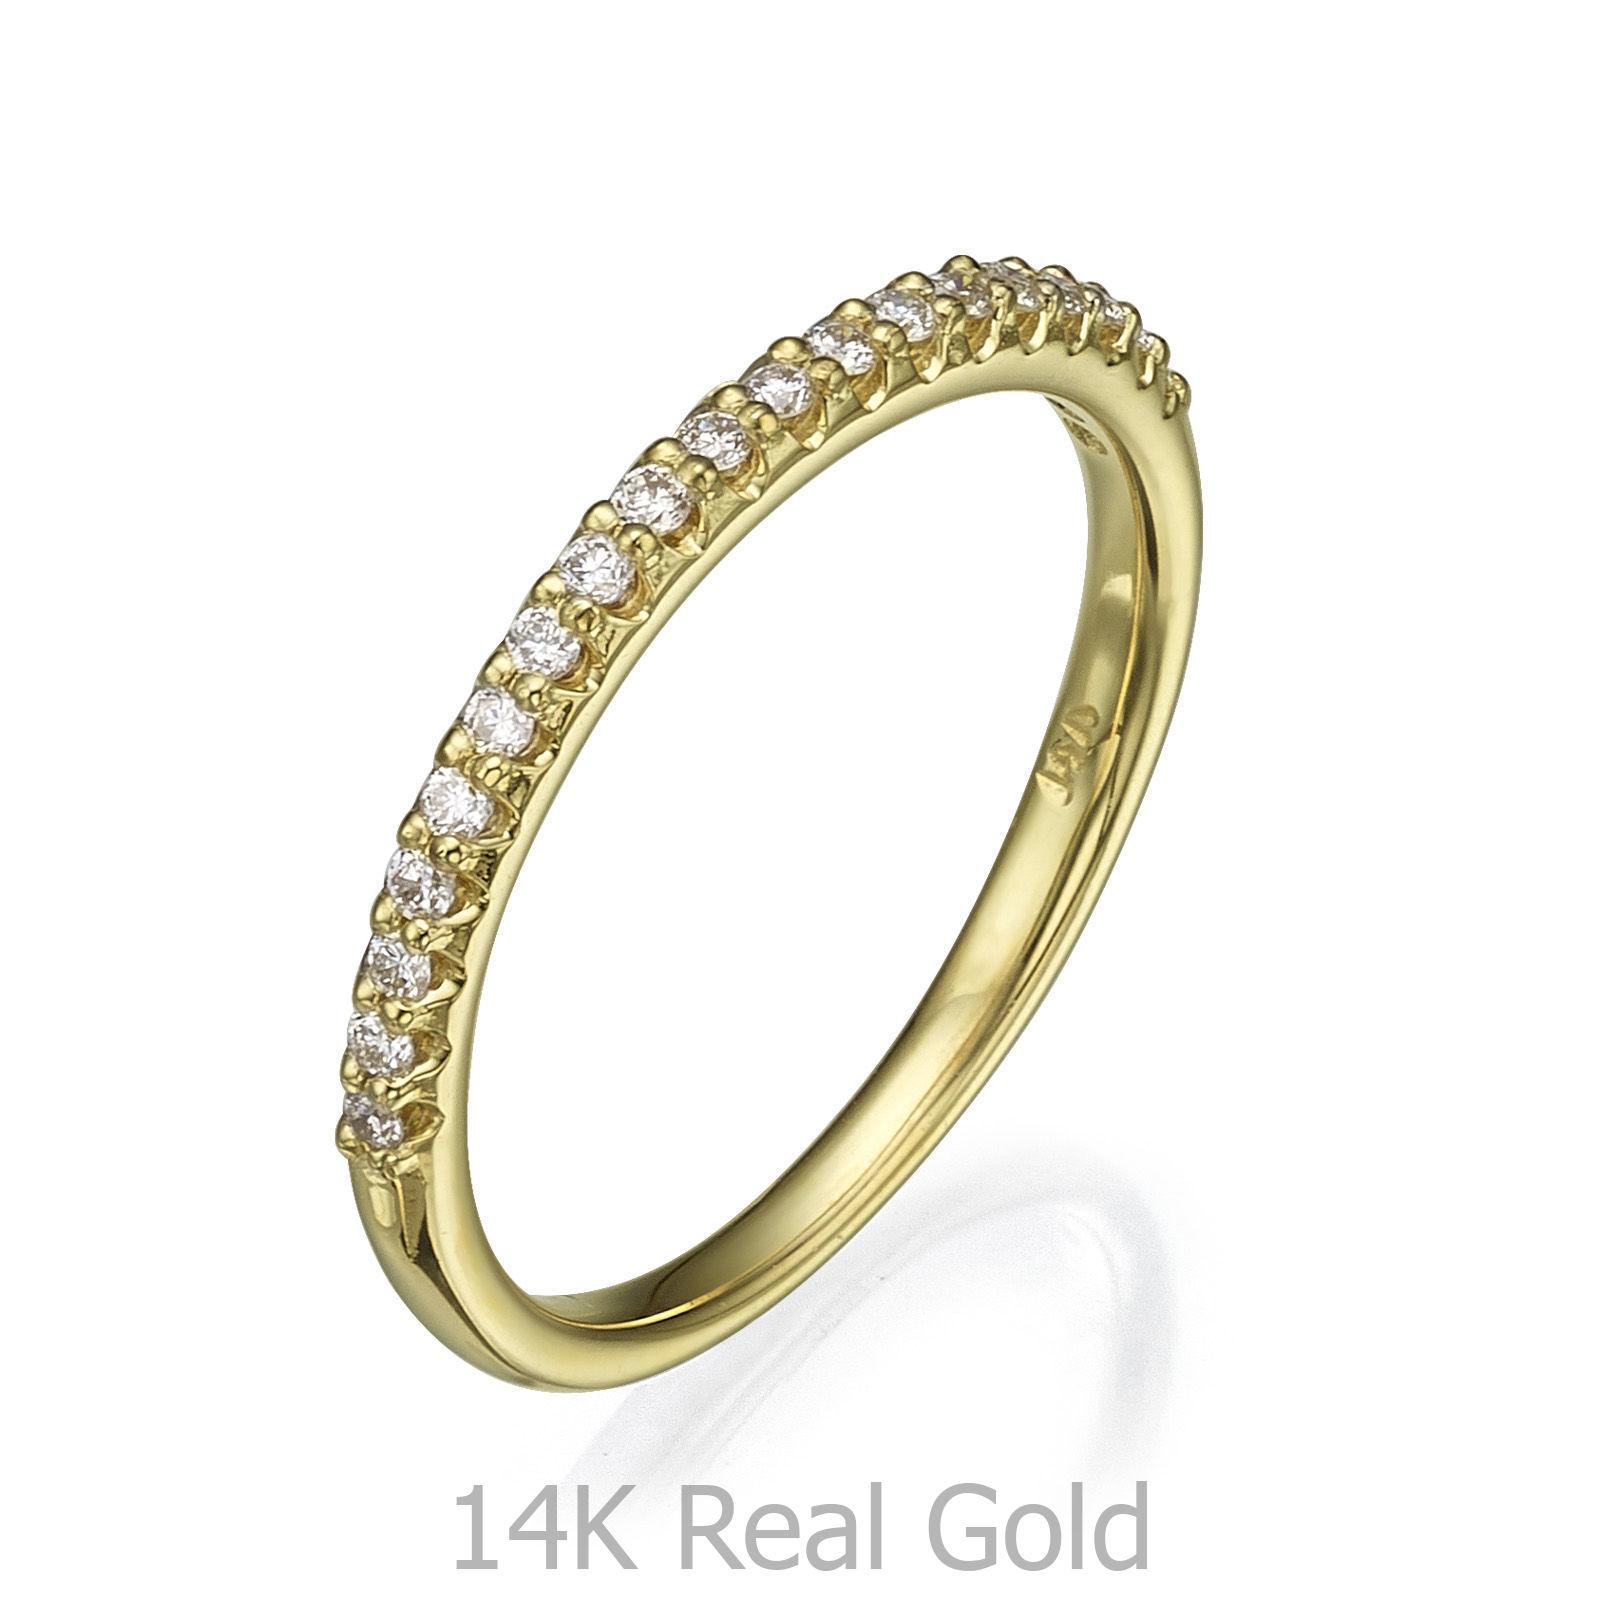 315007-rings-diamond-yellow-gold-diamondhvs-2.jpg (169 KB)